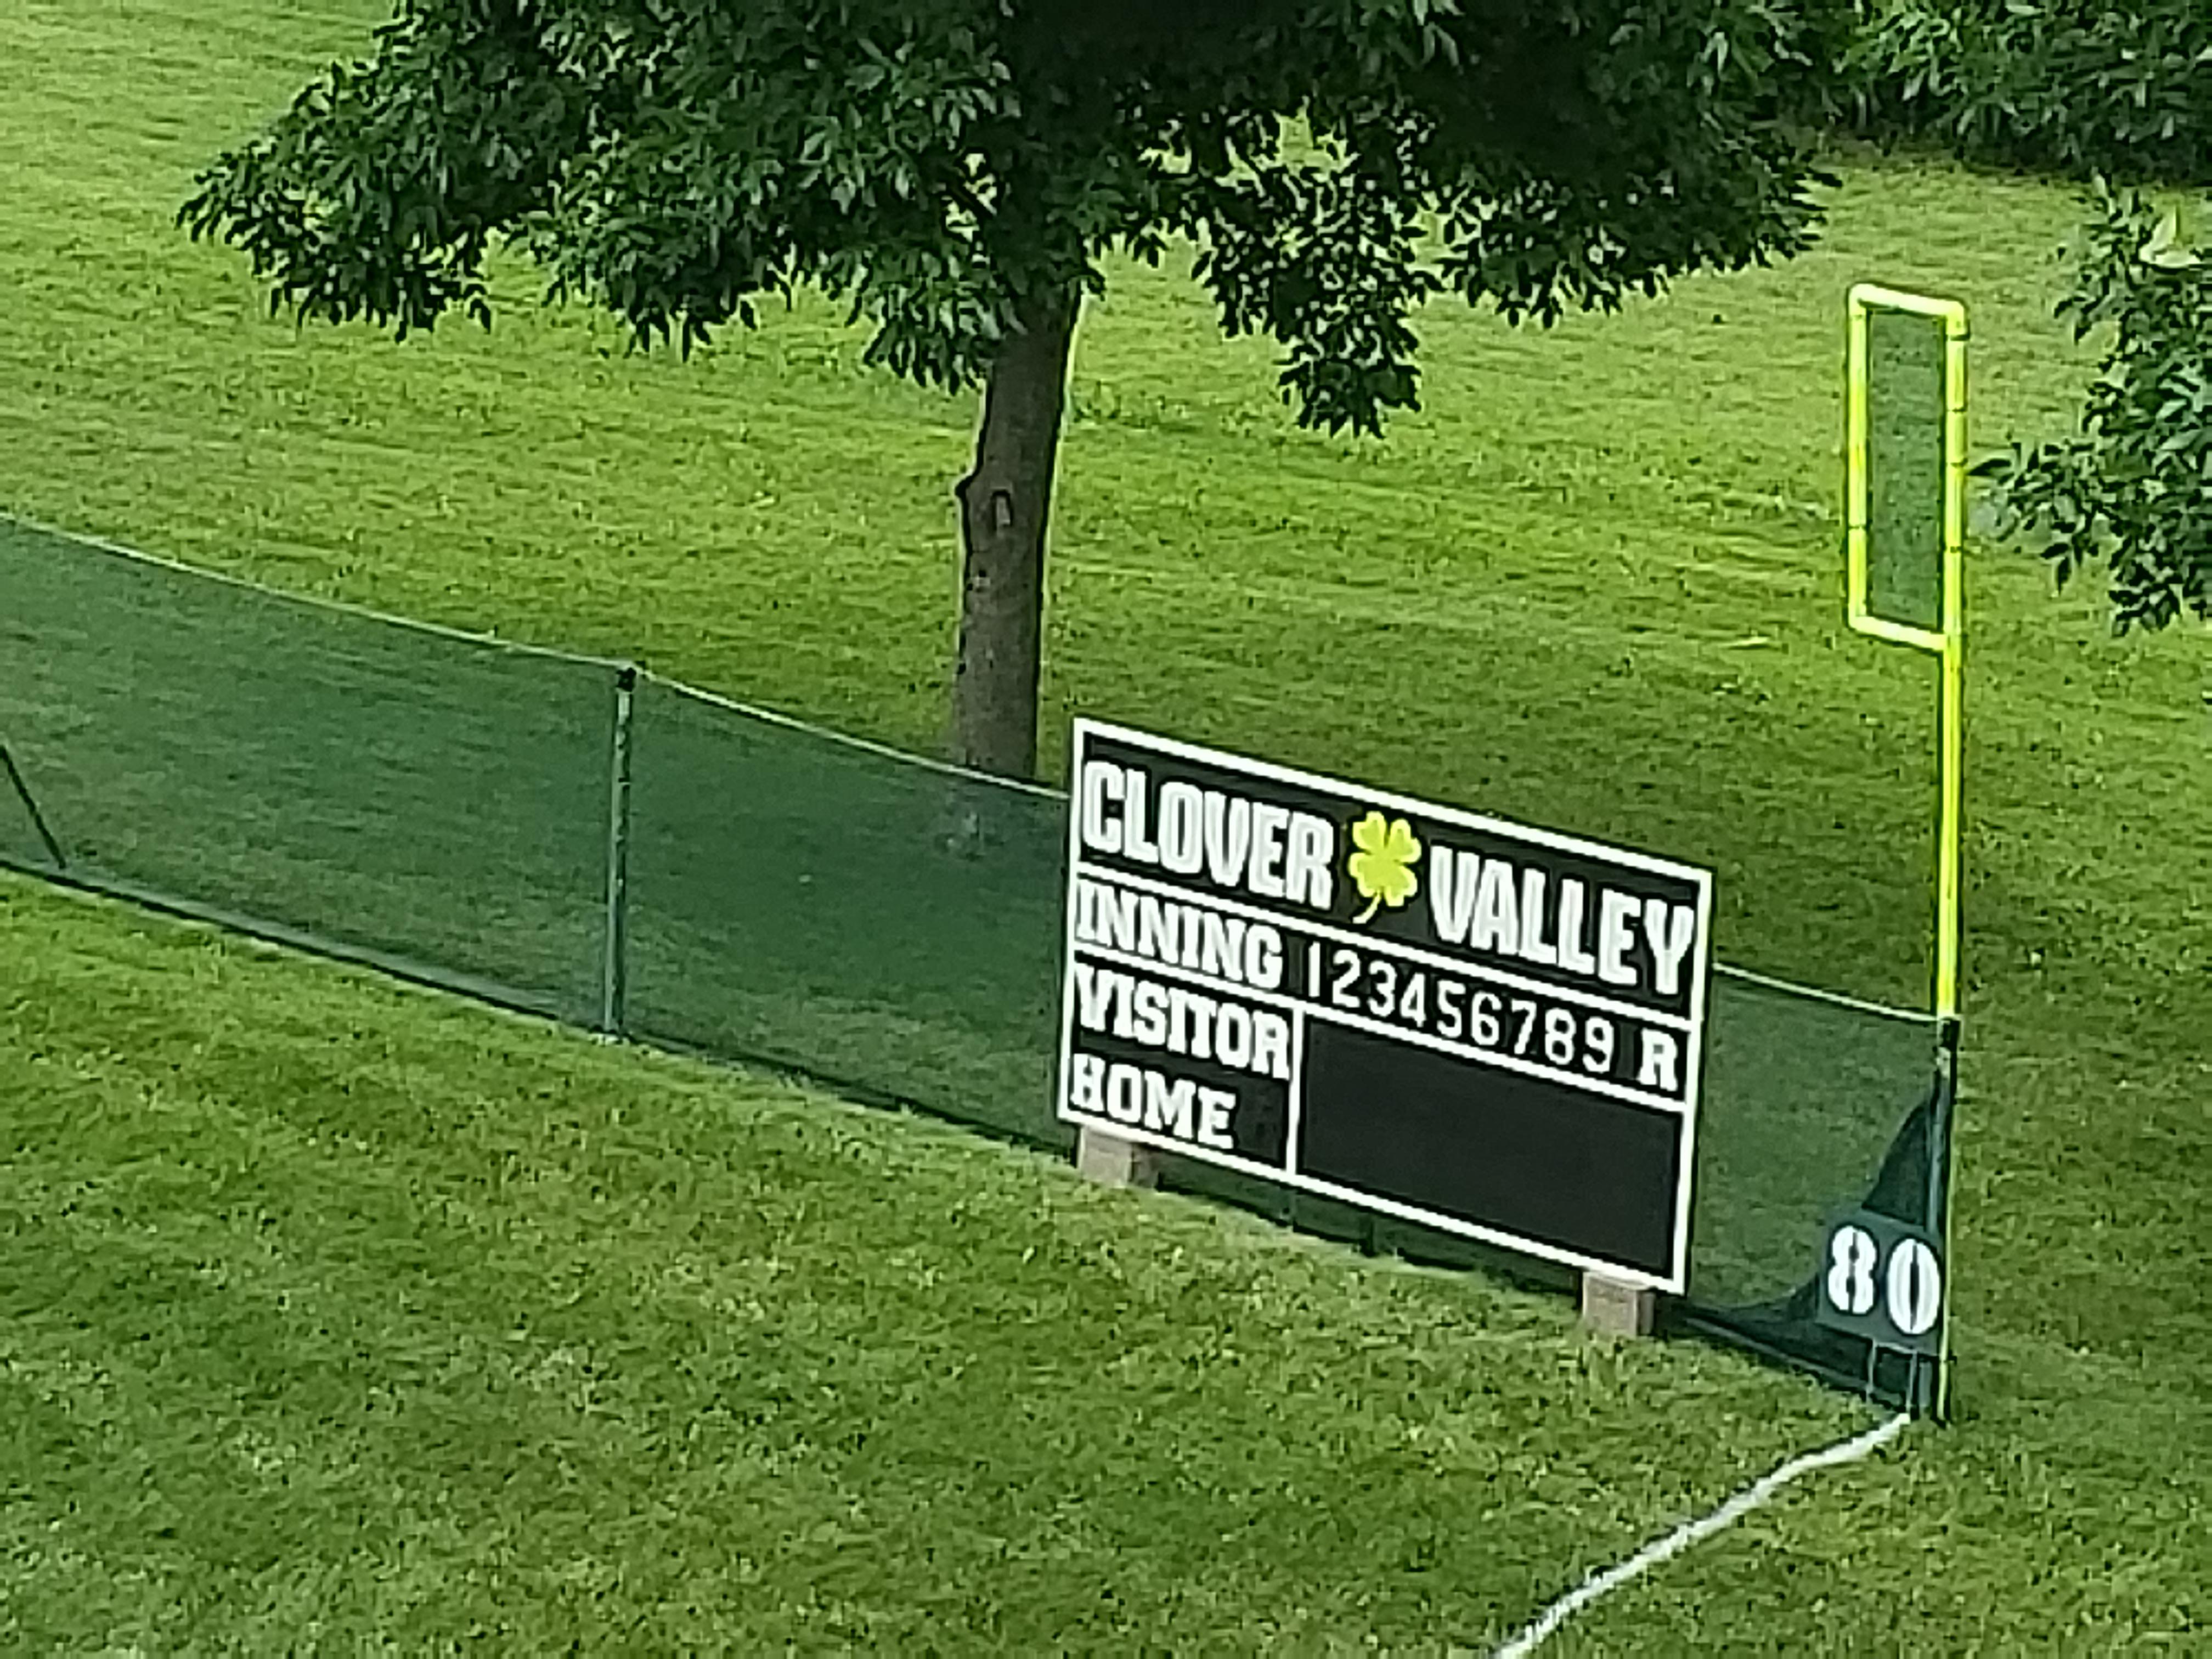 clover-wiffle-ball-field-4.jpg